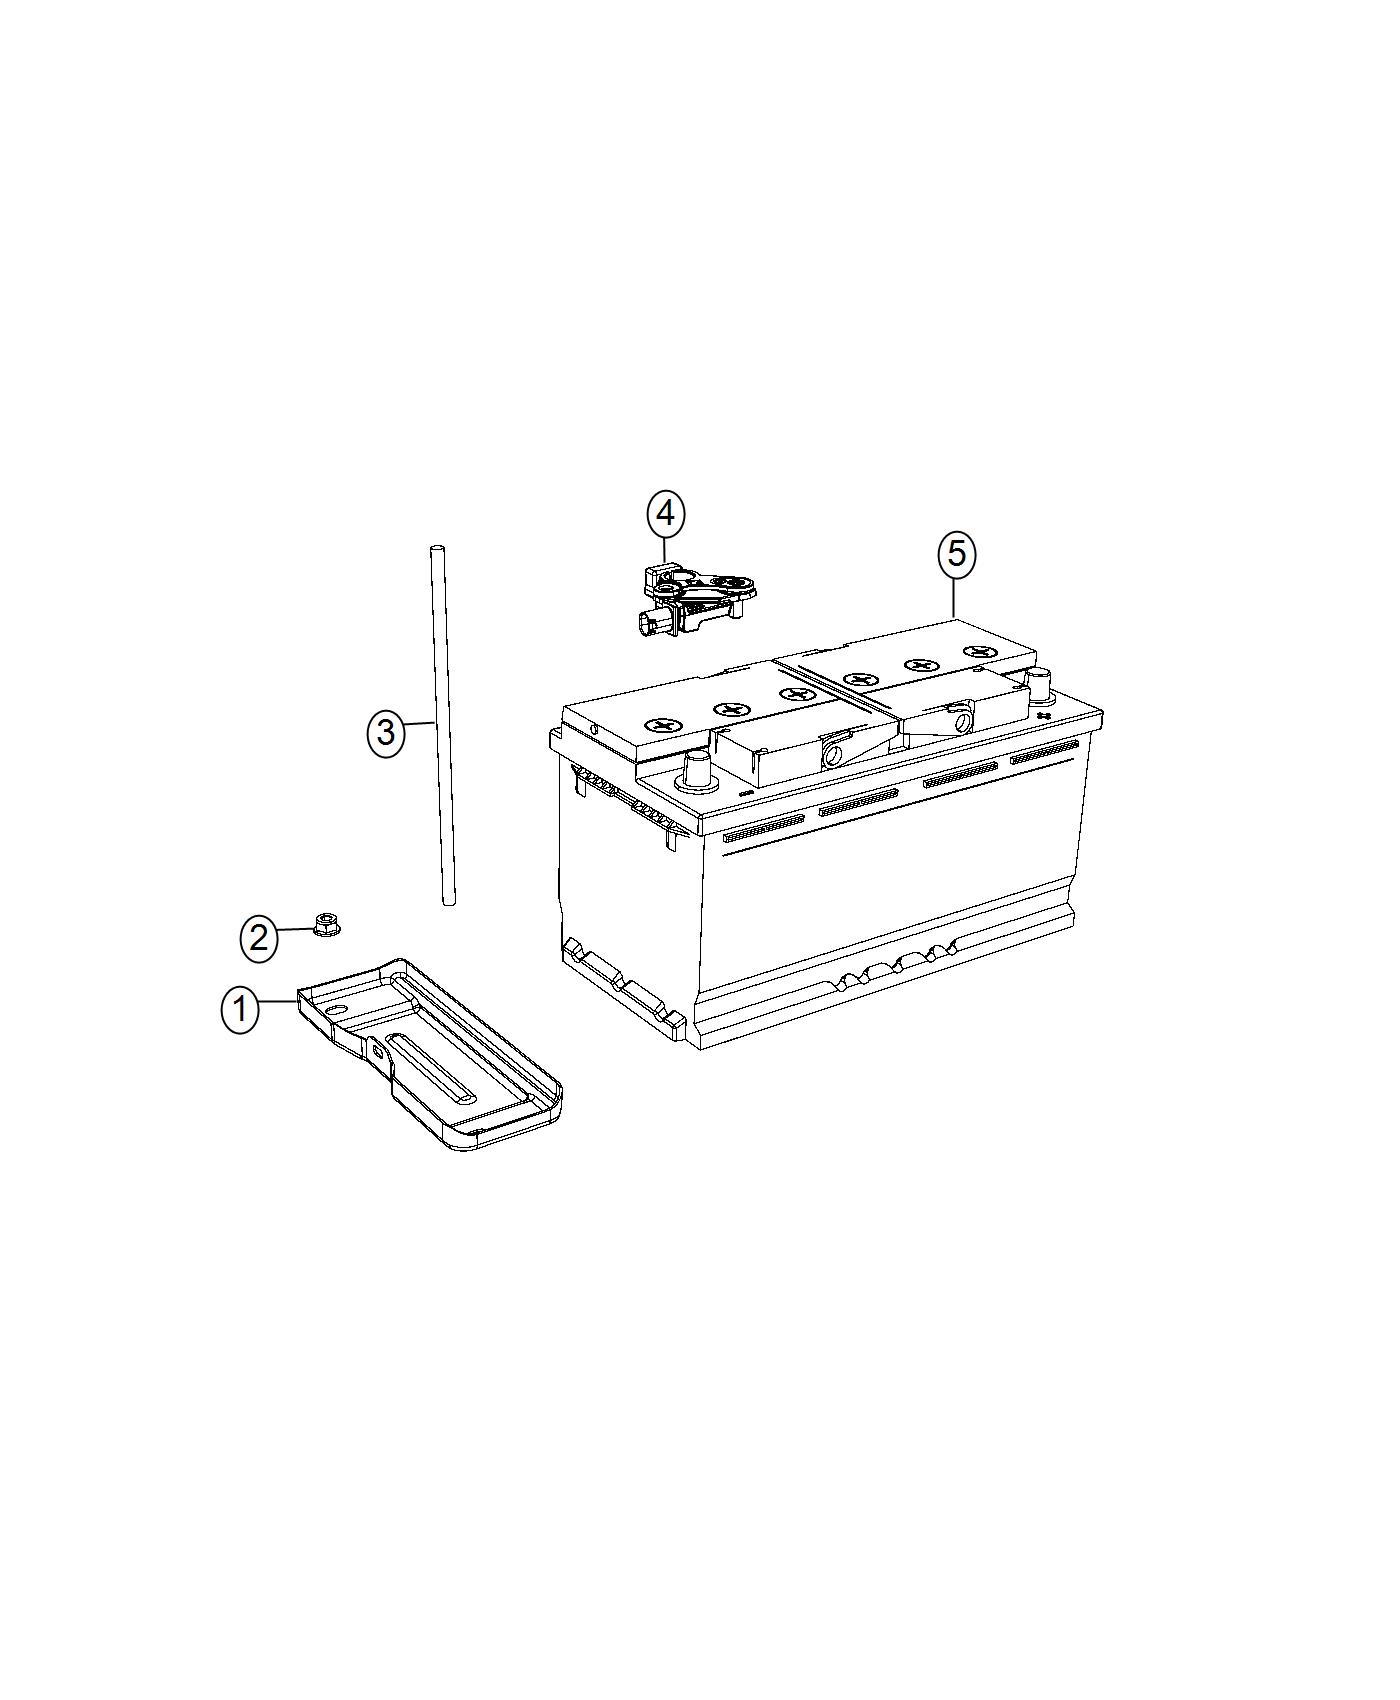 Jeep Grand Cherokee Sensor Battery